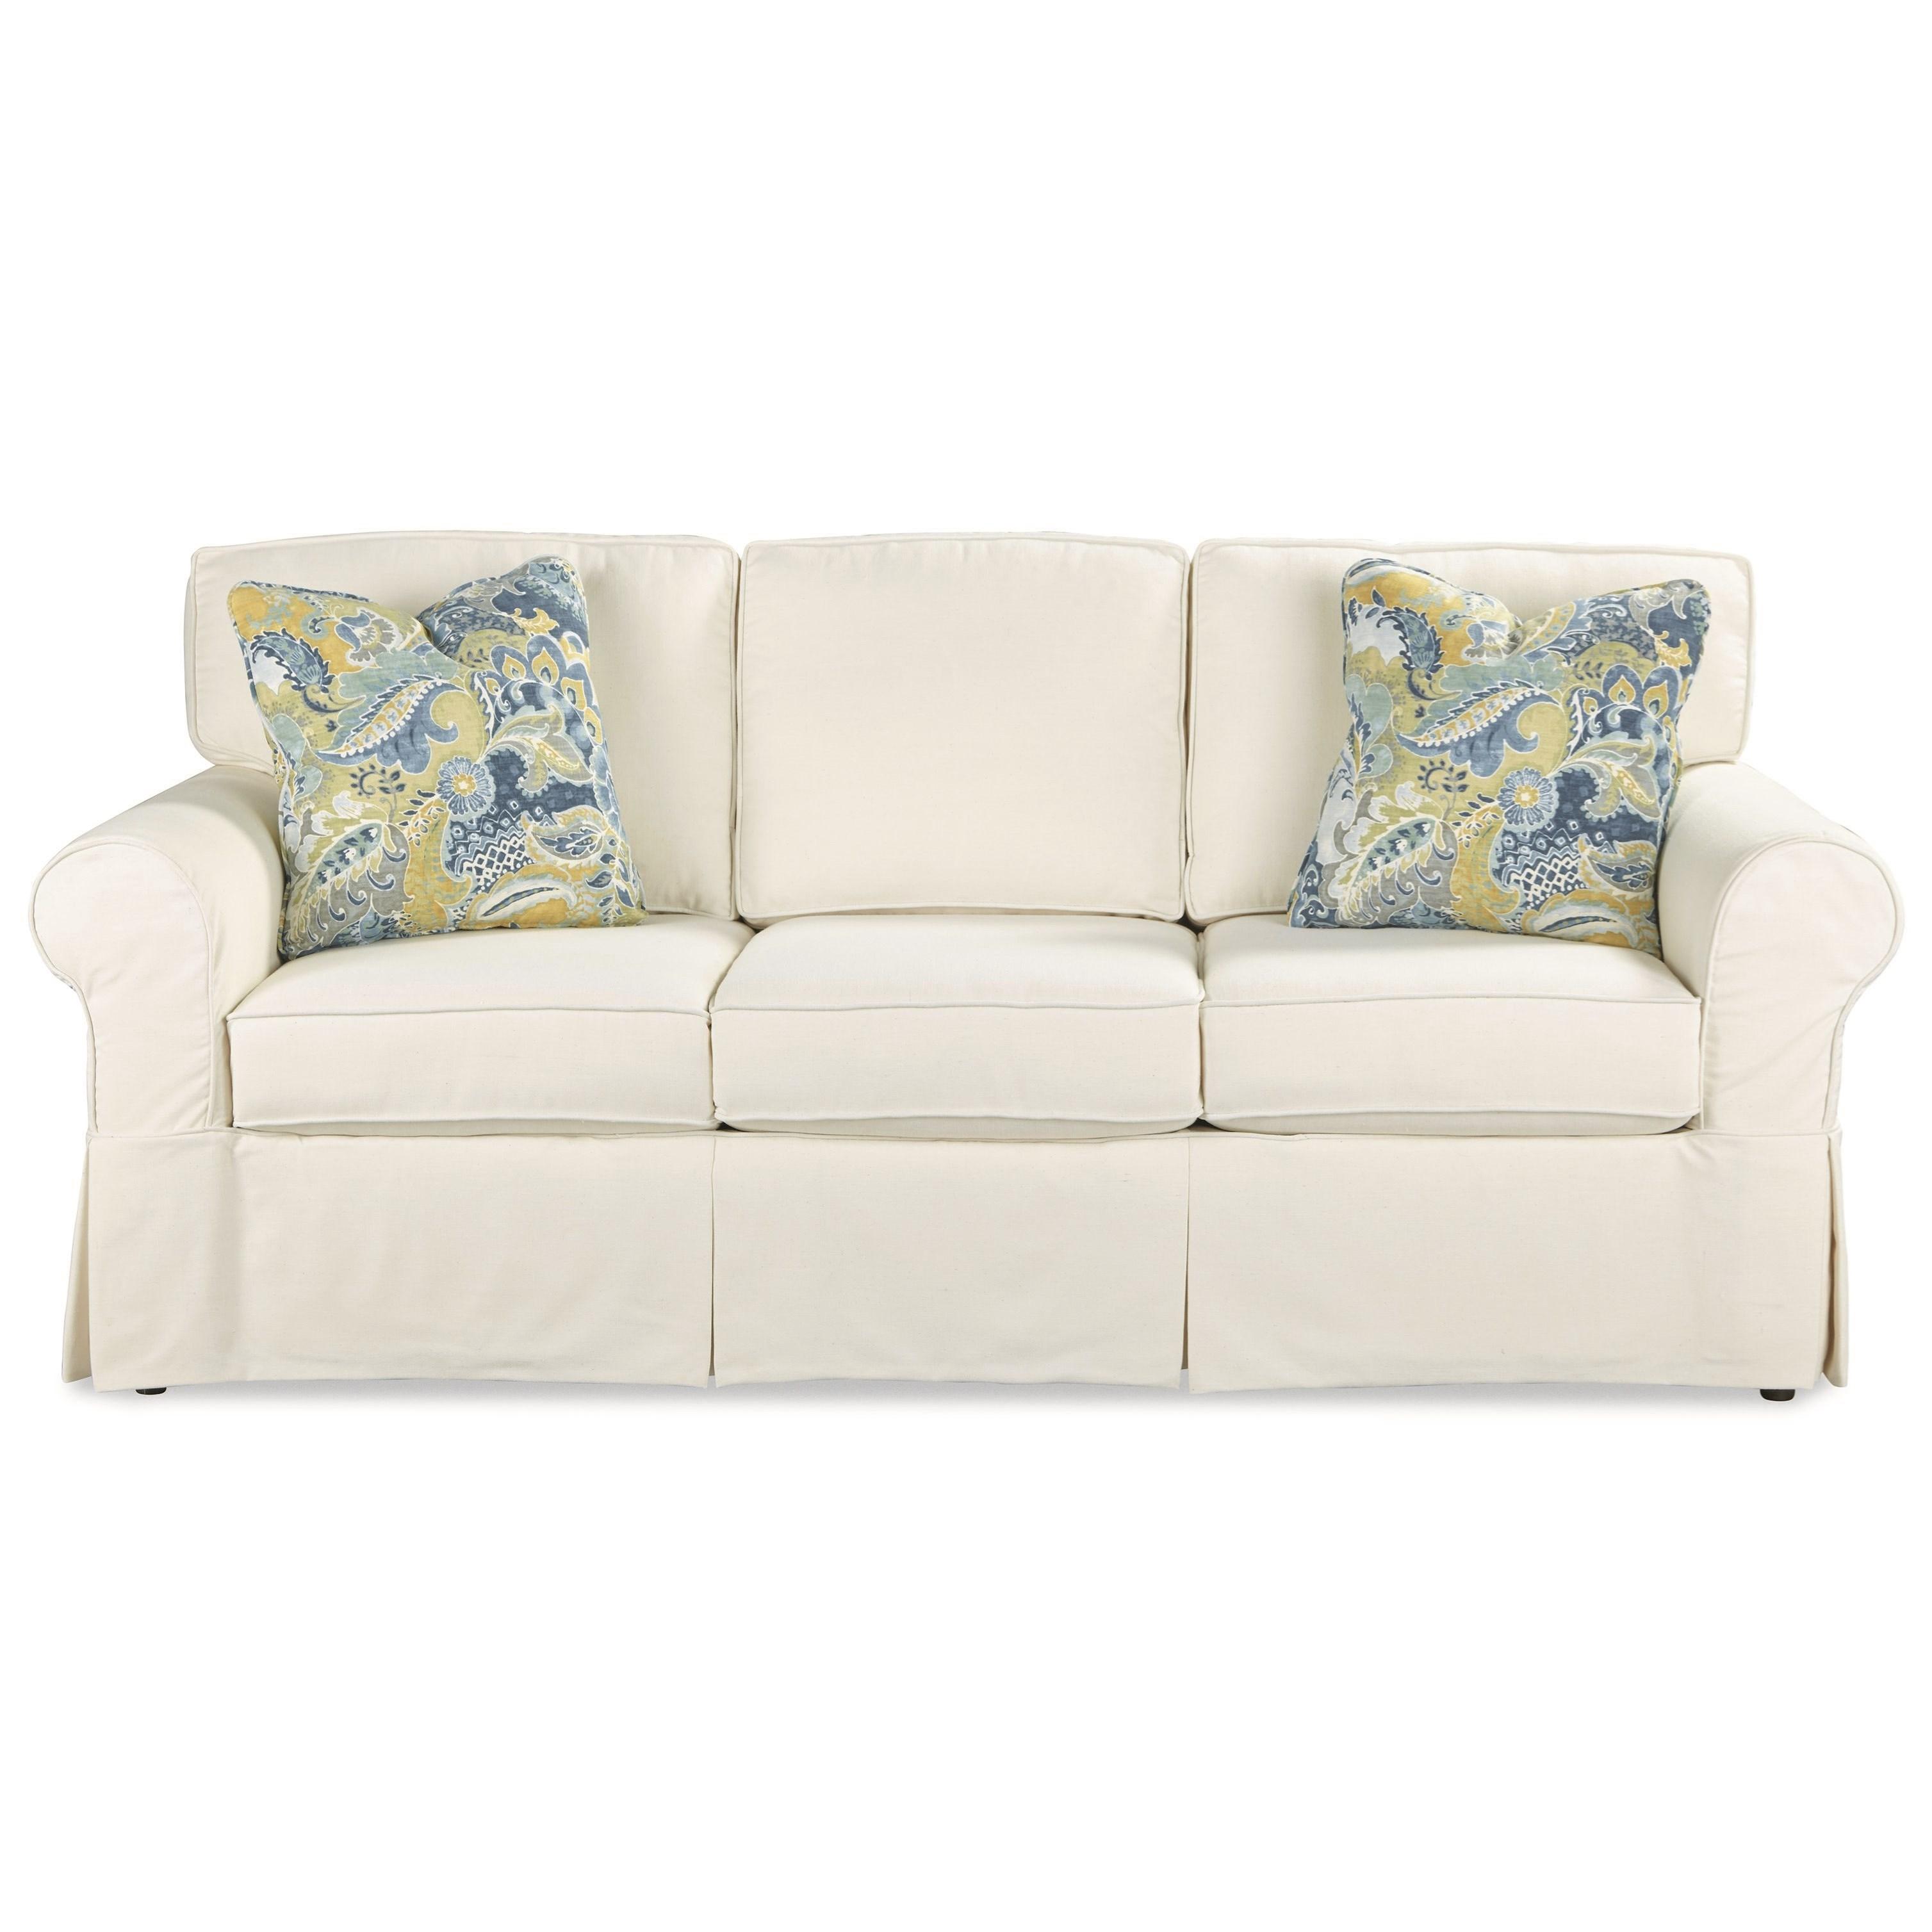 9229 Queen Sleeper Sofa w/ Memoryfoam Mattress by Craftmaster at Adcock Furniture